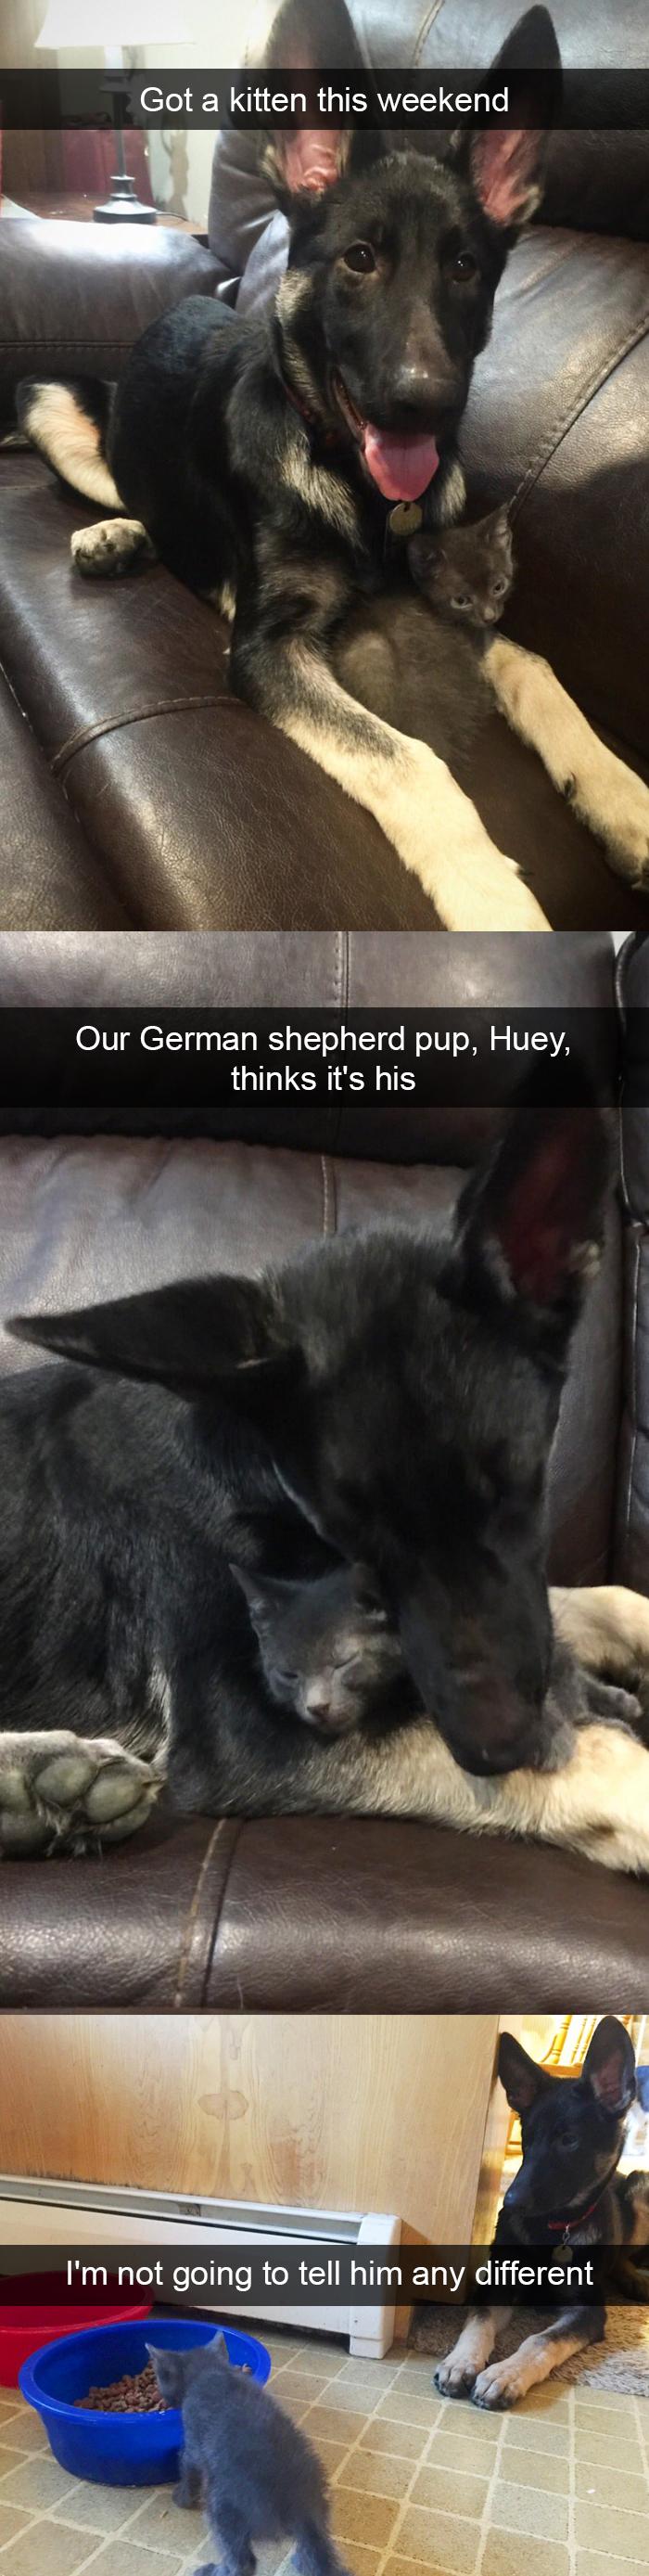 搞笑,狗,照片,Snapchats